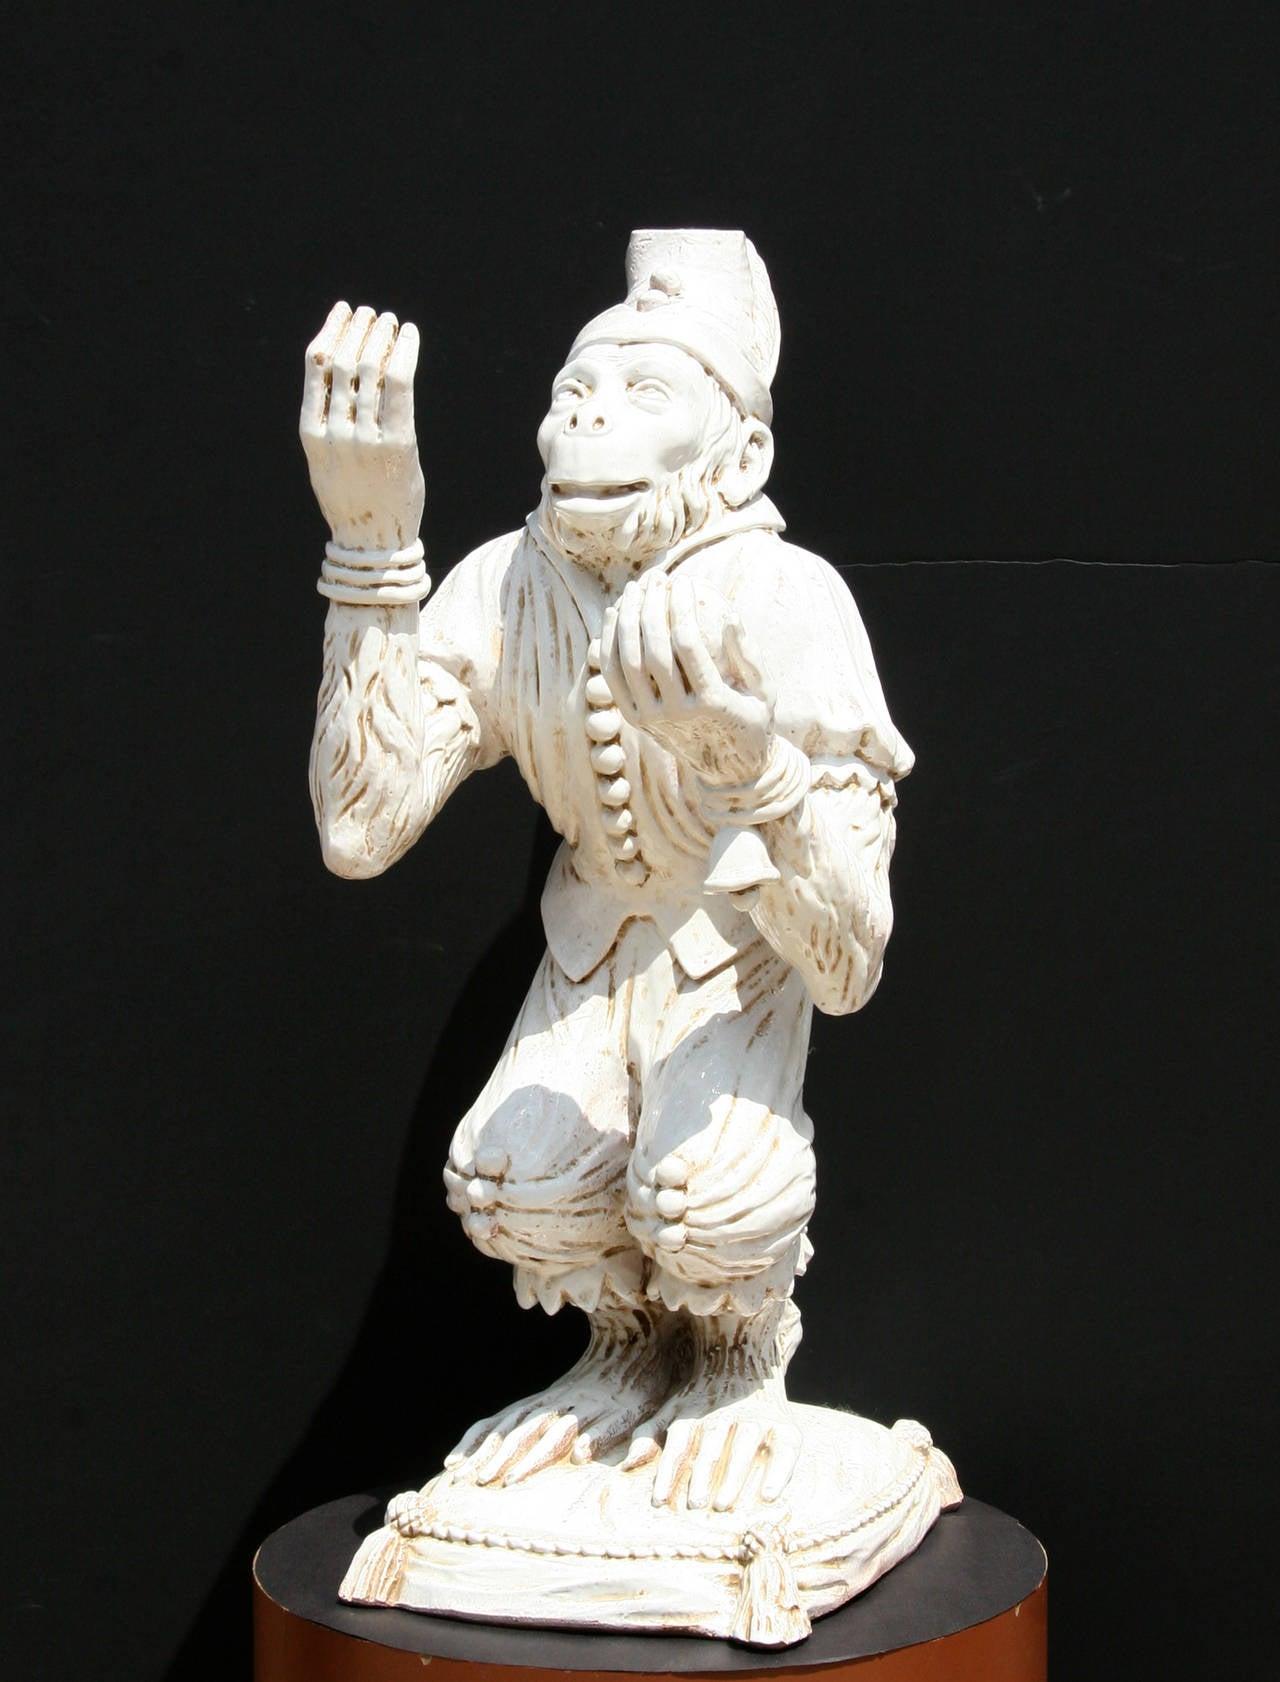 Juggling Monkey, Porcelain Sculpture - Beige Figurative Sculpture by Unknown